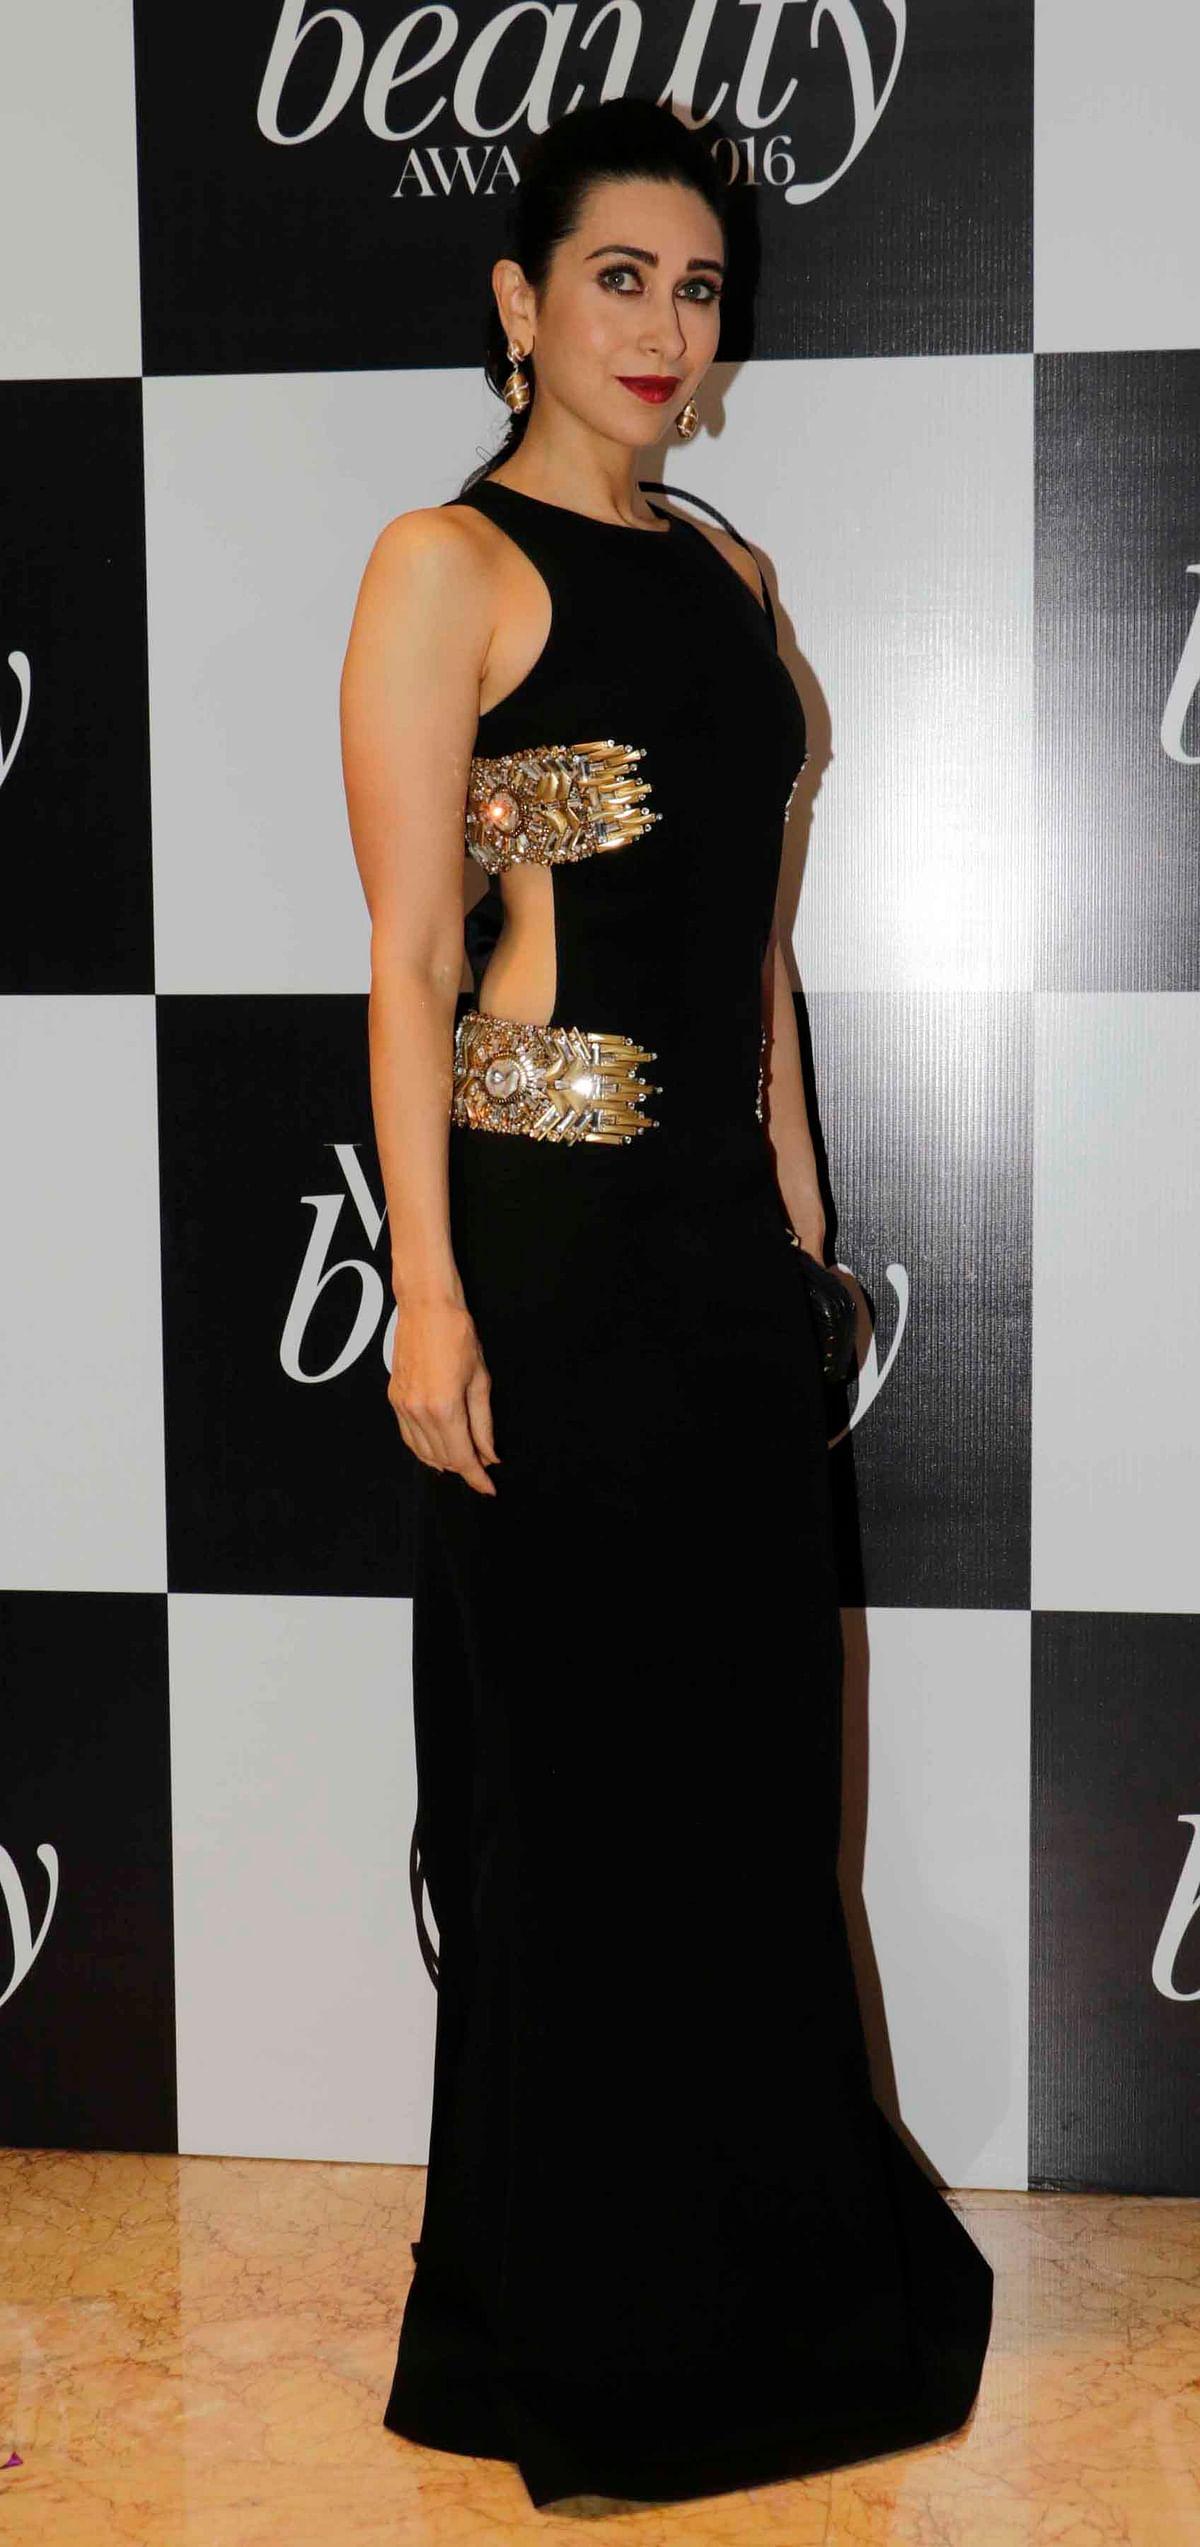 Karisma Kapoor at the event. (Photo: Yogen Shah)